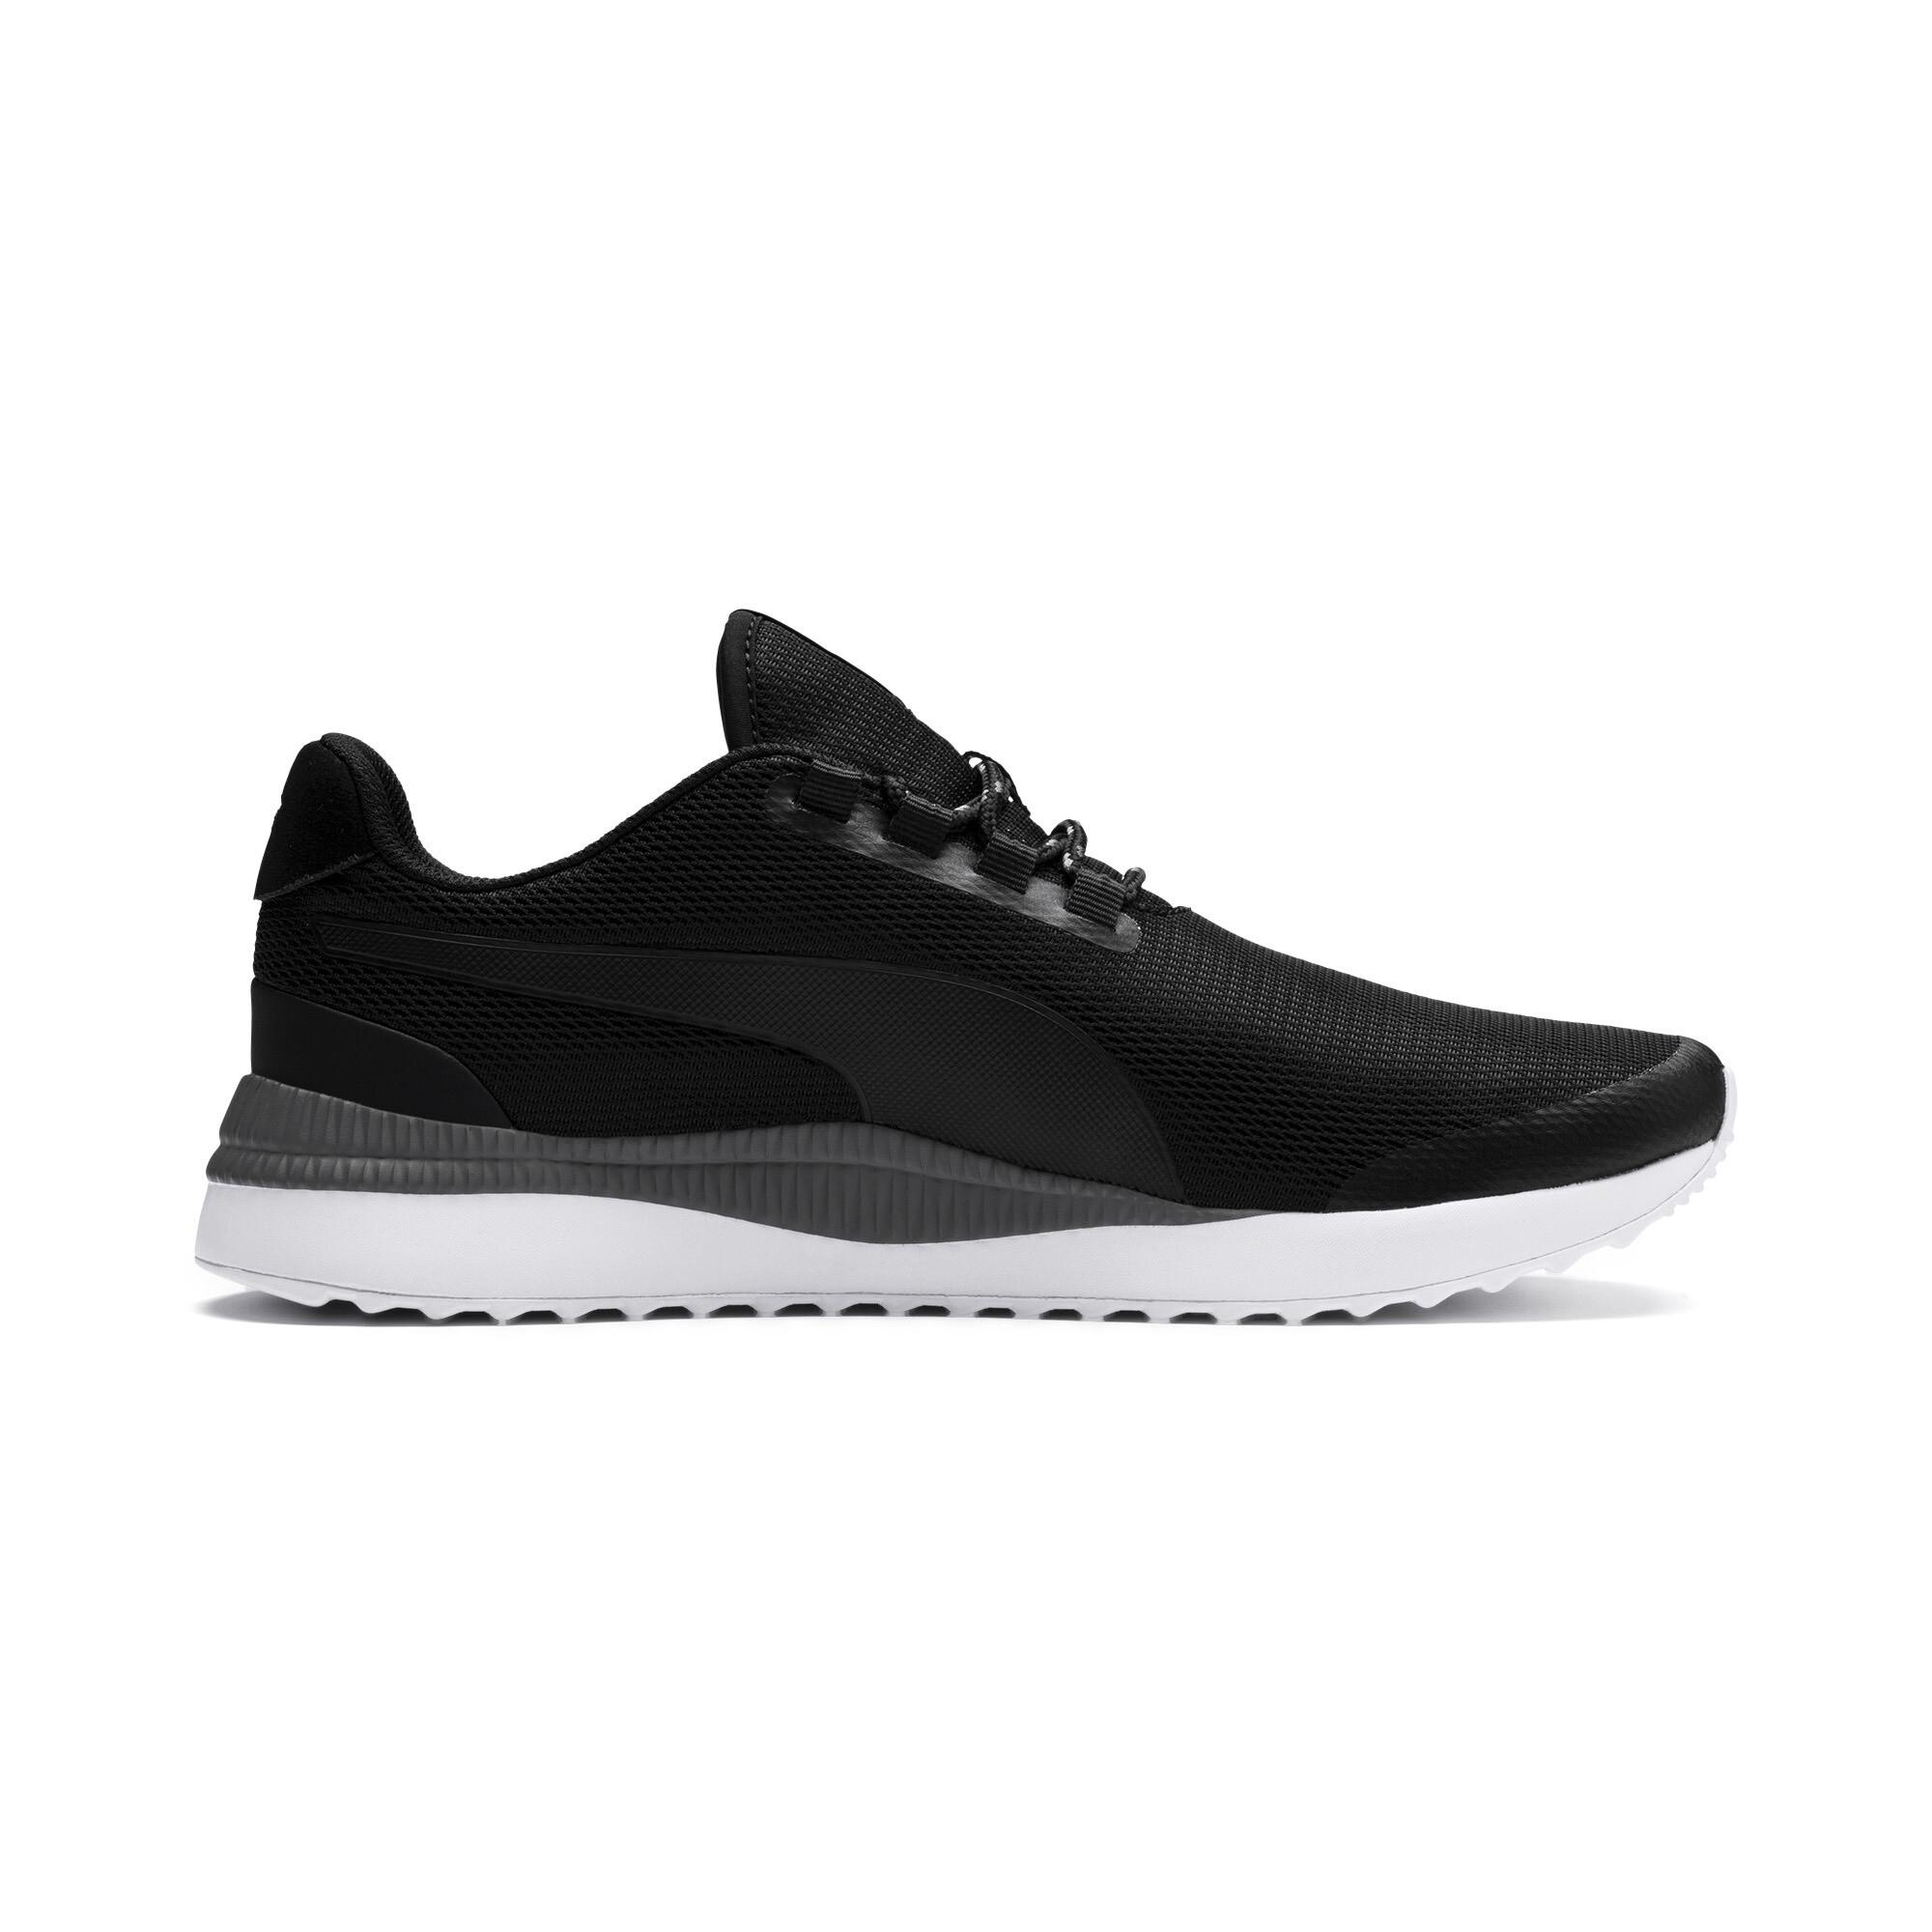 PUMA-Pacer-Next-FS-Men-039-s-Sneakers-Unisex-Shoe-Basics thumbnail 6